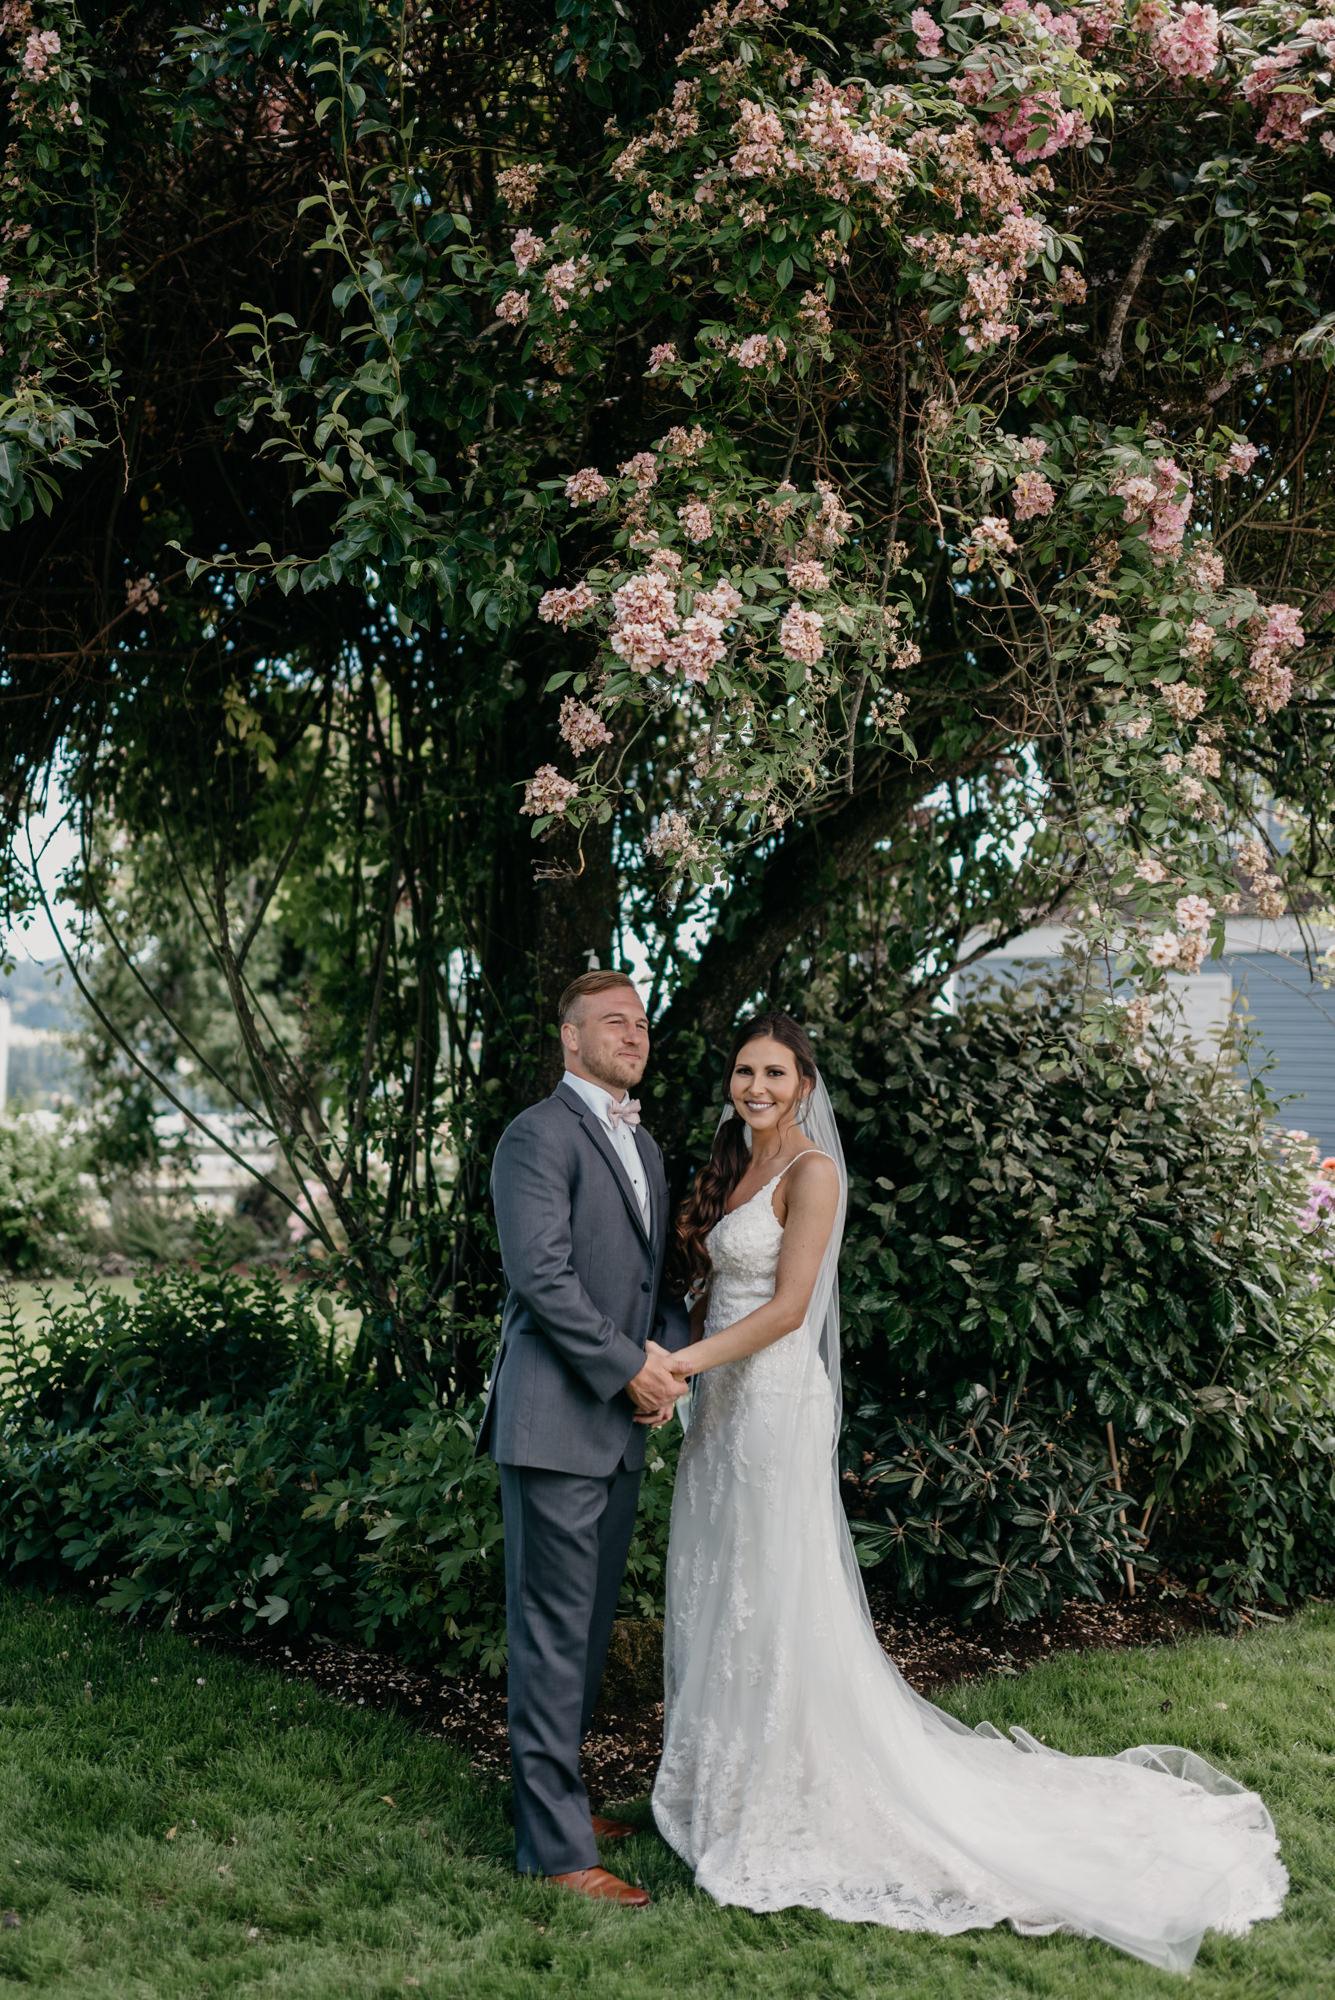 37-lake-oswego-wedding-portland-couple-rose-tree.jpg